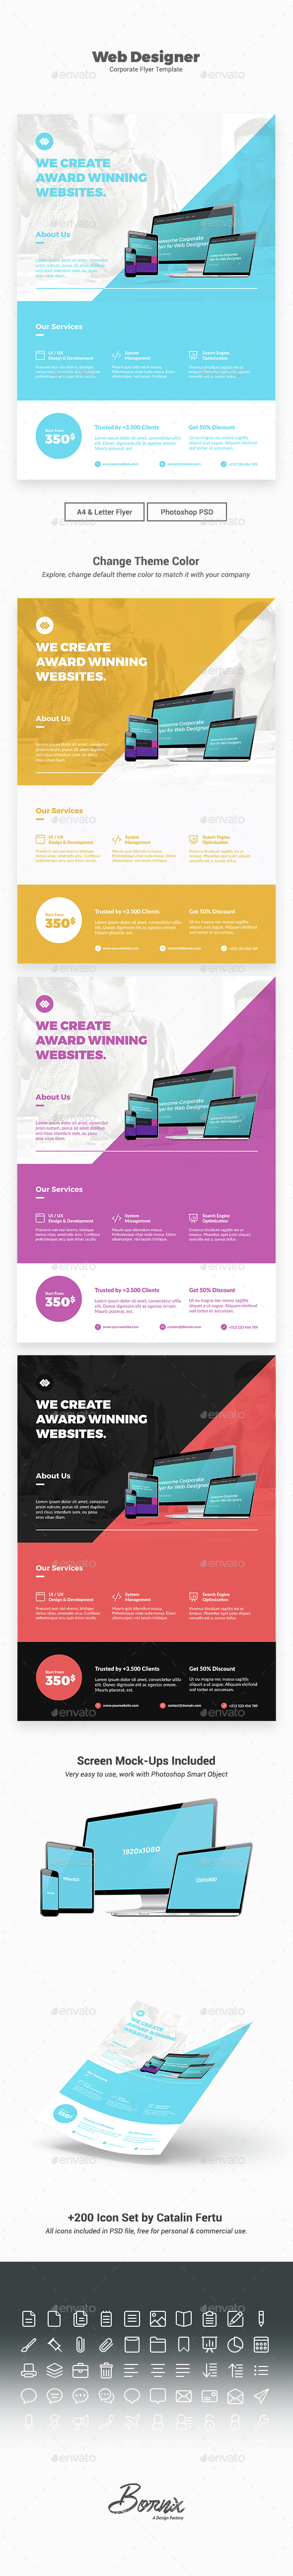 Web Designer Flyer Template - Corporate Flyers